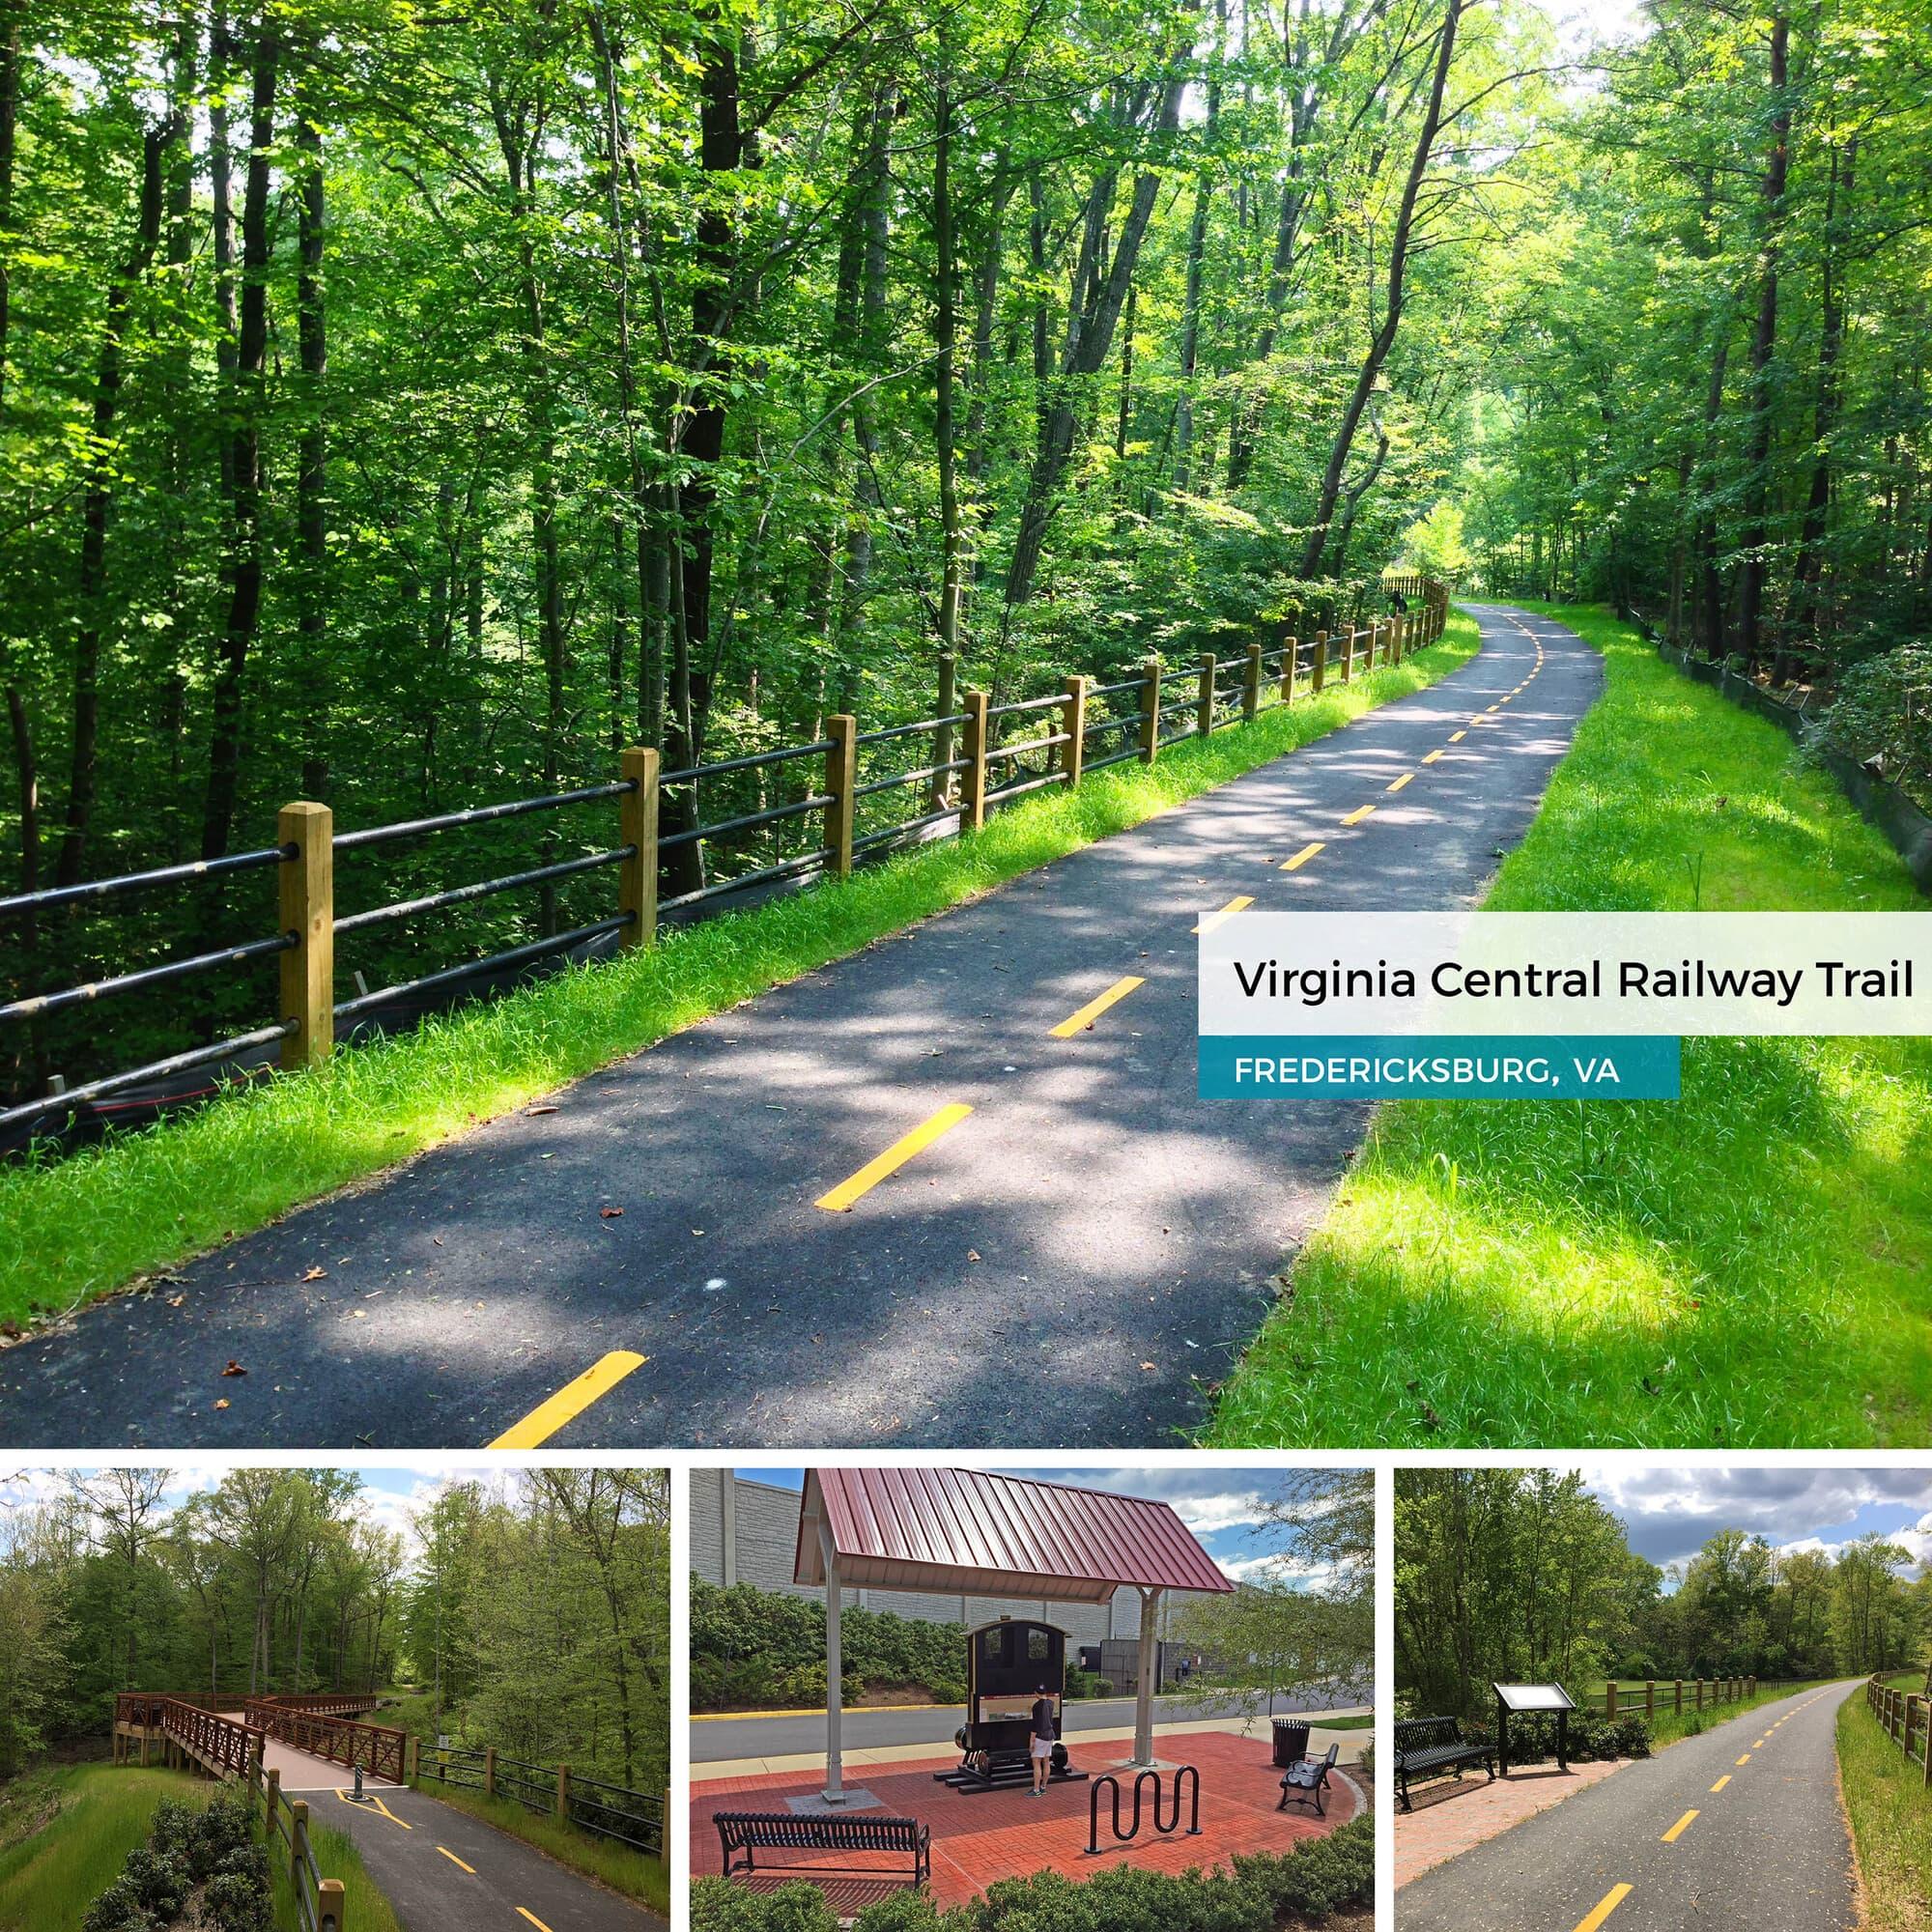 Virginia Central Railway Trail in Fredericksburg, VA